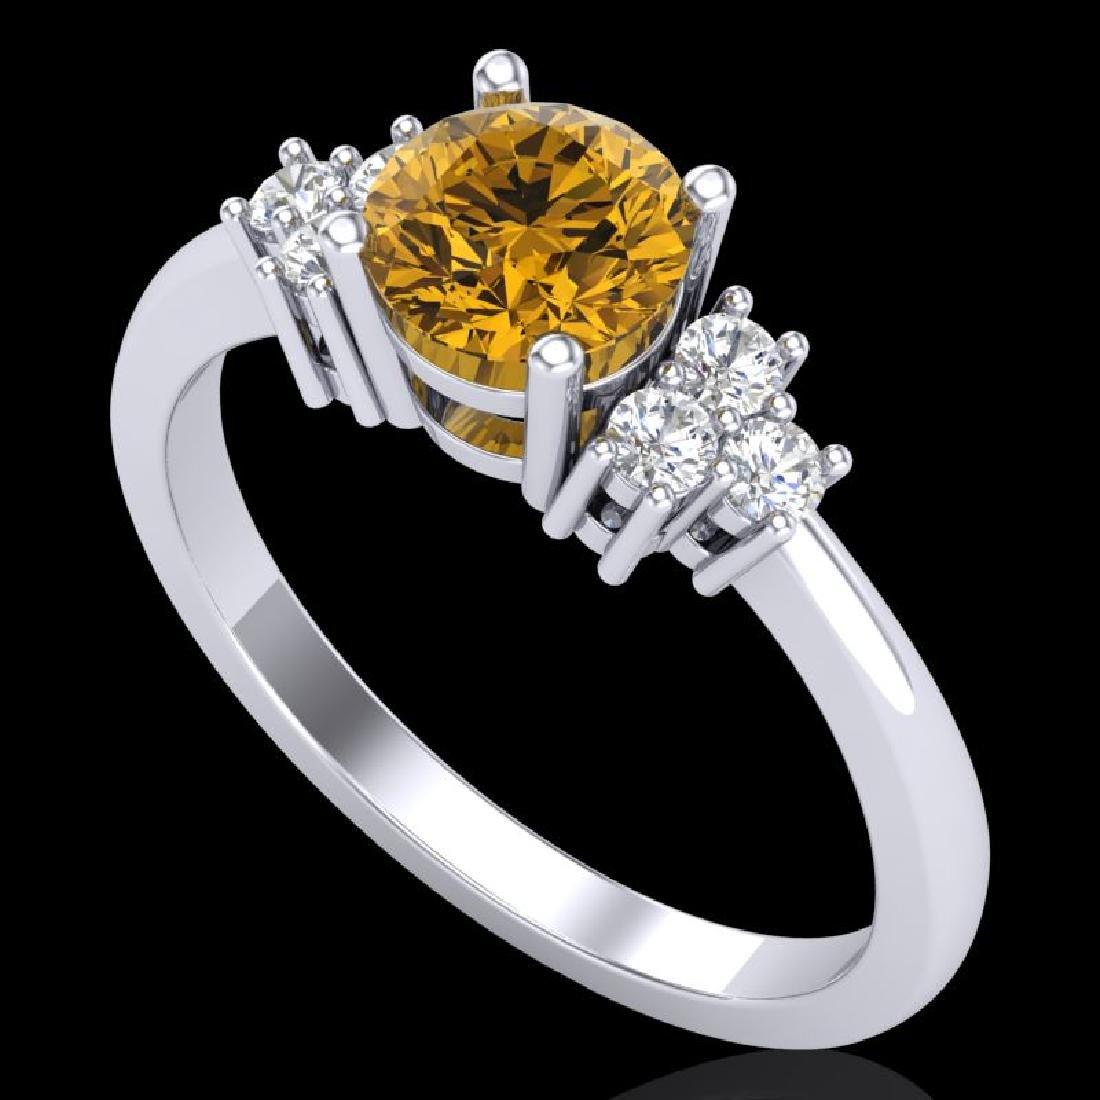 1 CTW Intense Yellow Diamond Solitaire Engagement